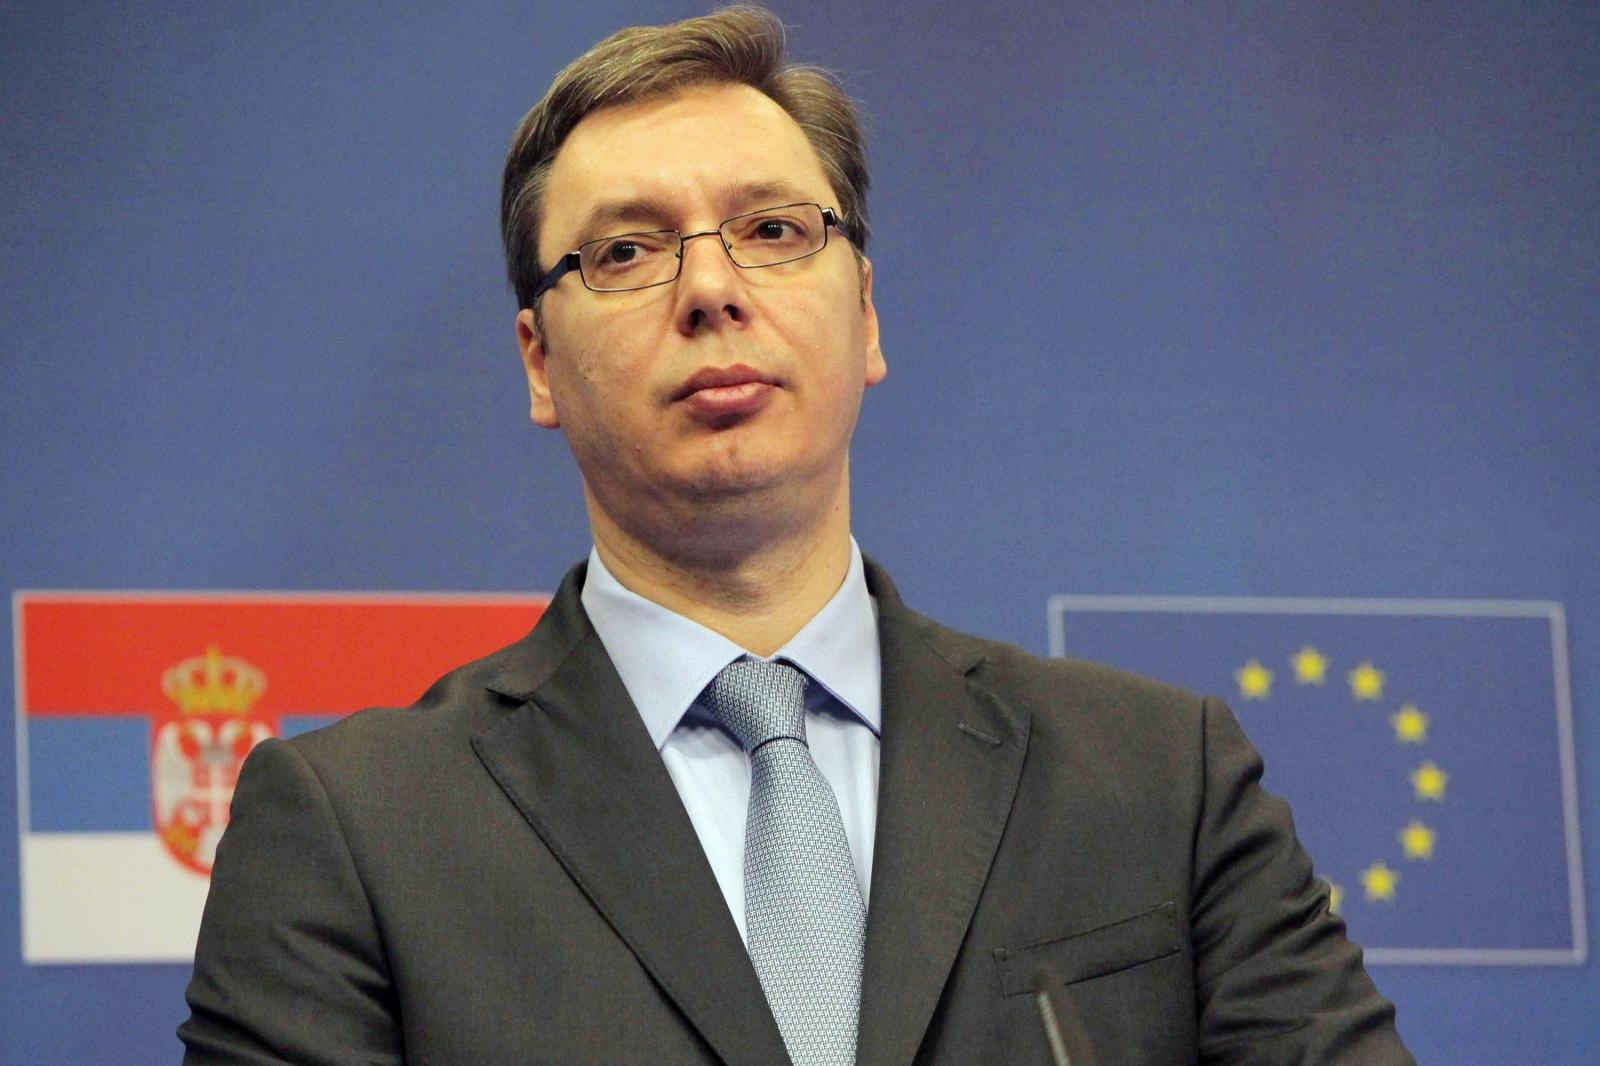 BRUXELLES Srbija otvorila dva, a Crna Gora jedno pregovaračko poglavlje